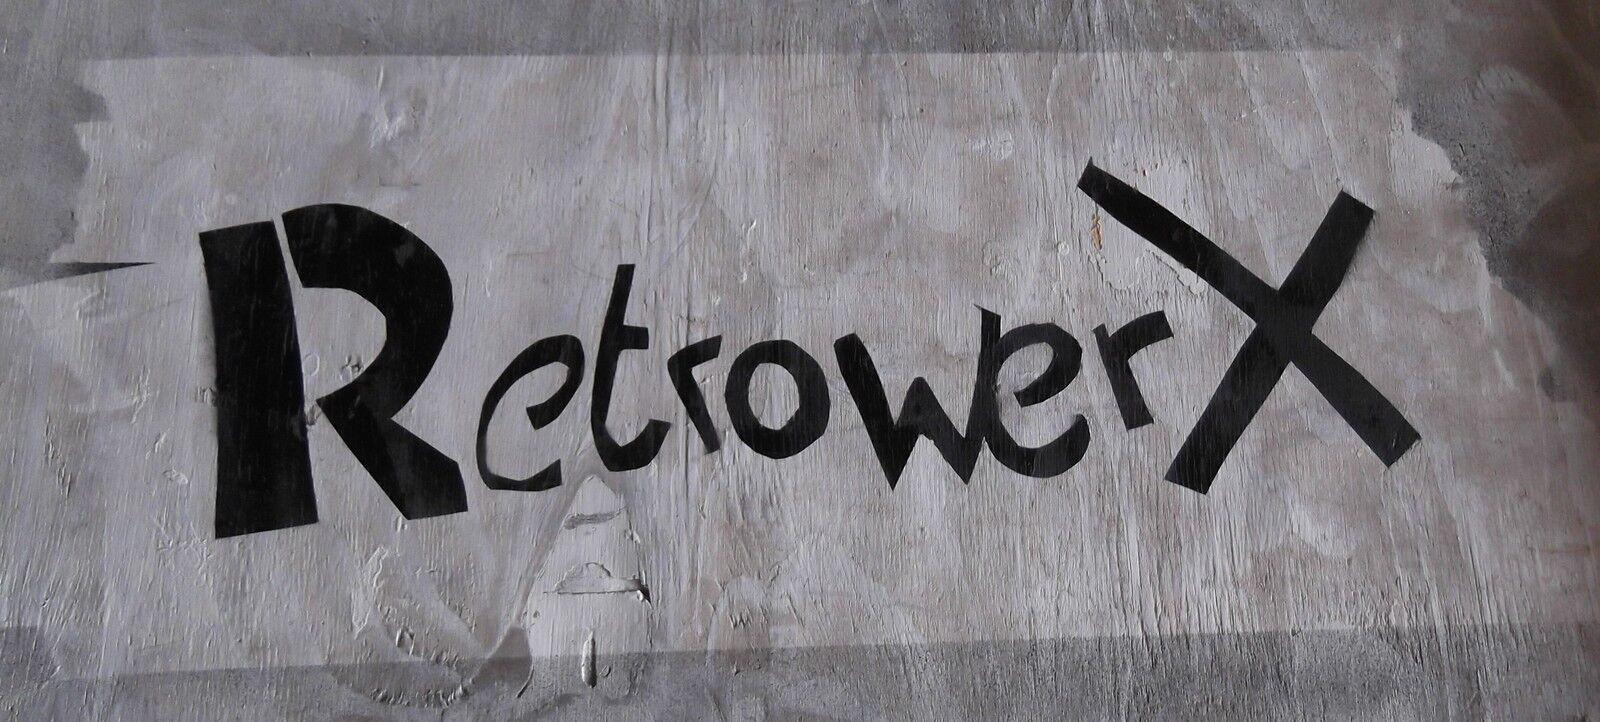 RetrowerX